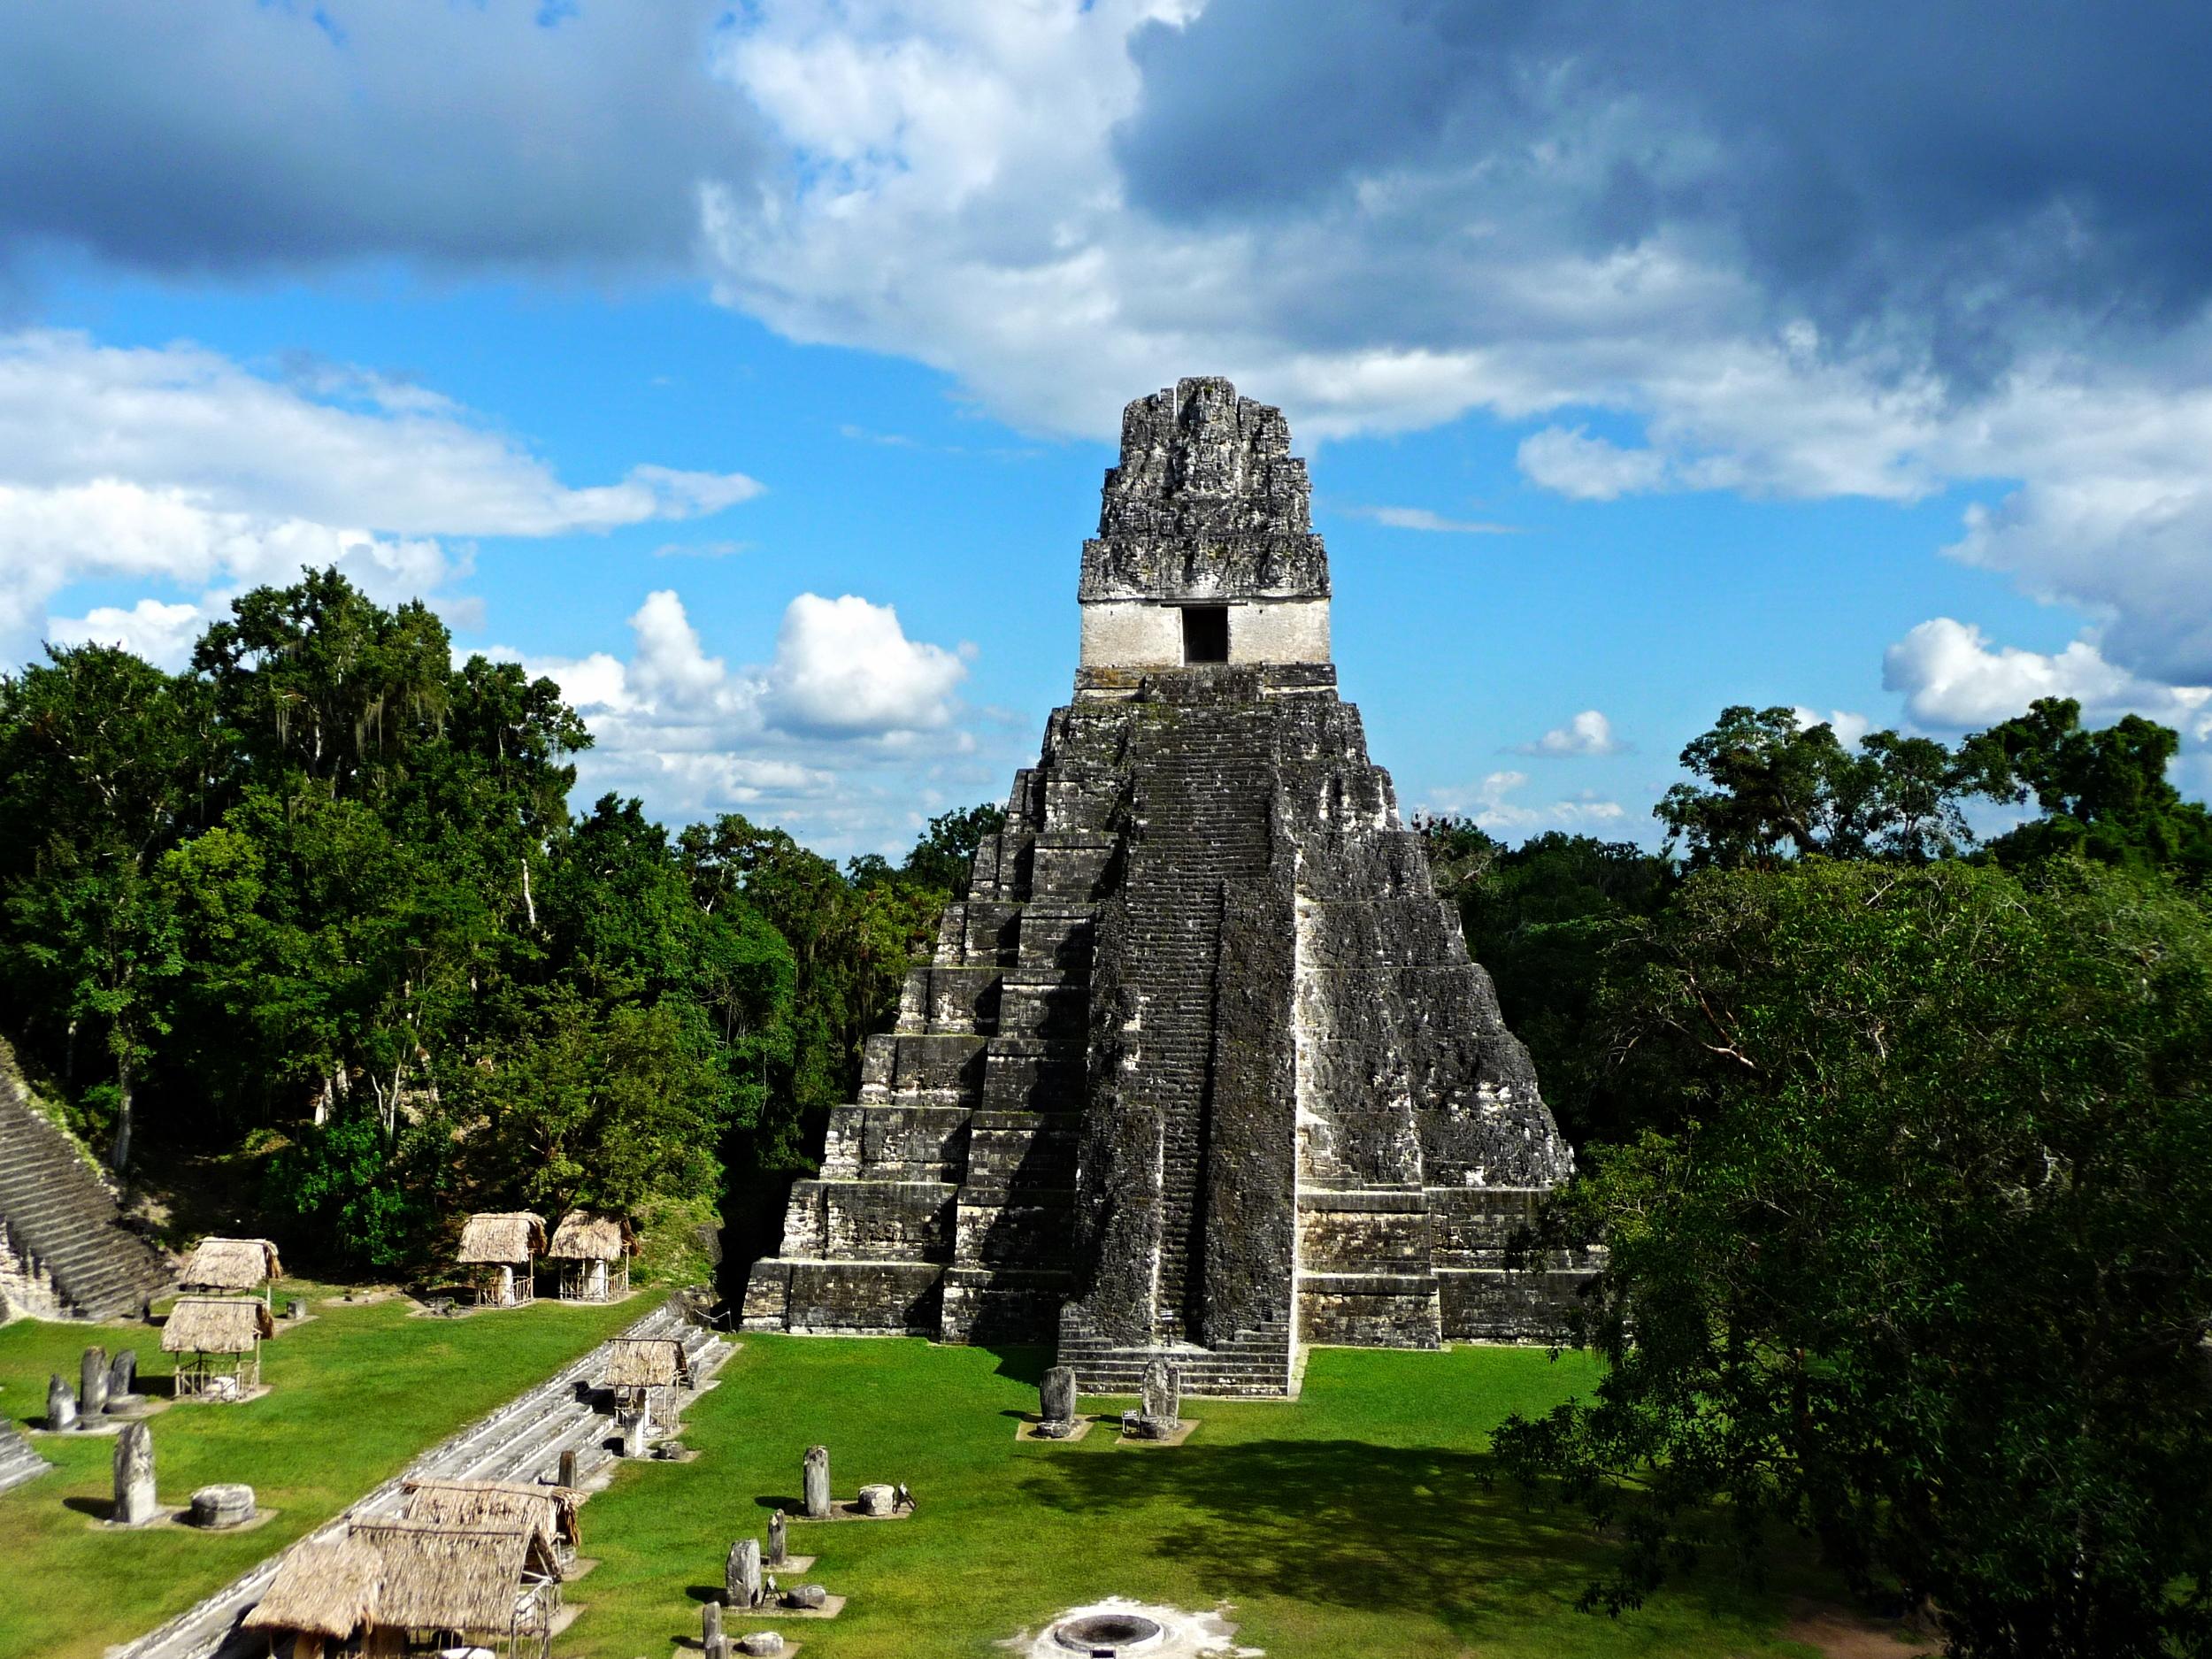 Templo Del Gran Jaguar - Tikal Maya Site - Belize Vacation Packages - Tikal - SabreWing Travel